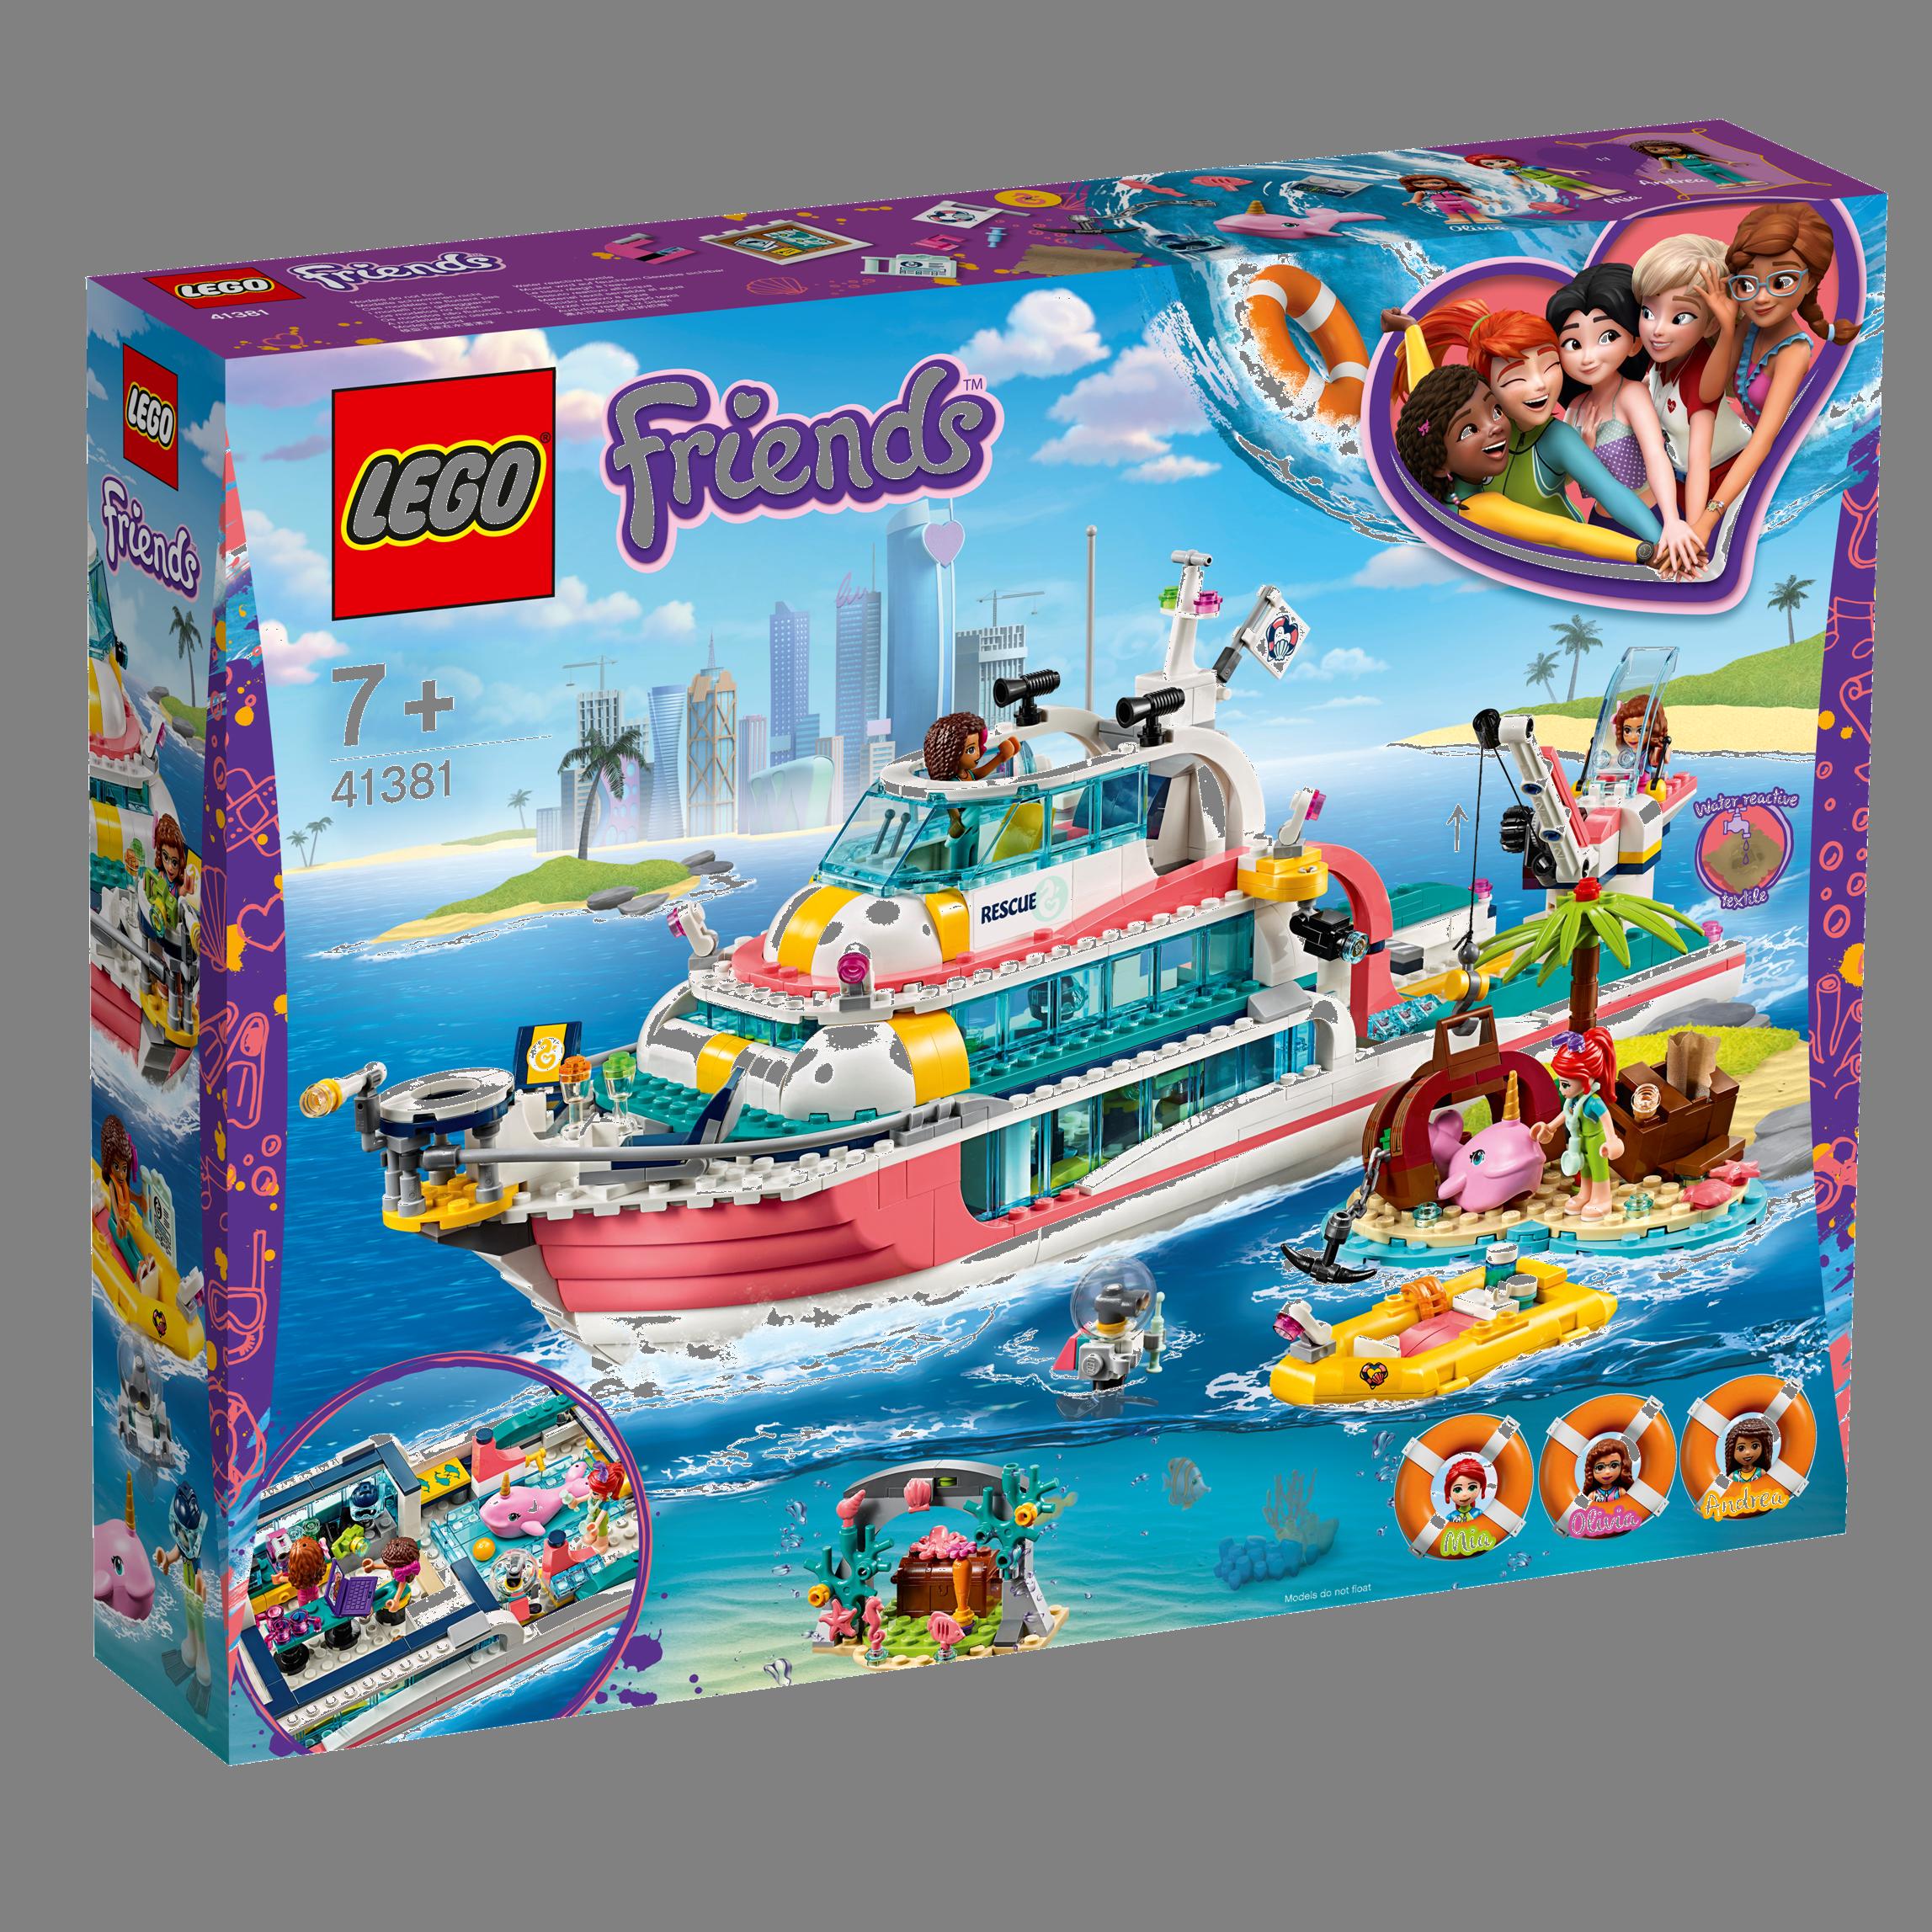 Friends - Catalogue | Secret Chamber - Educational toys, Toys, LEGO